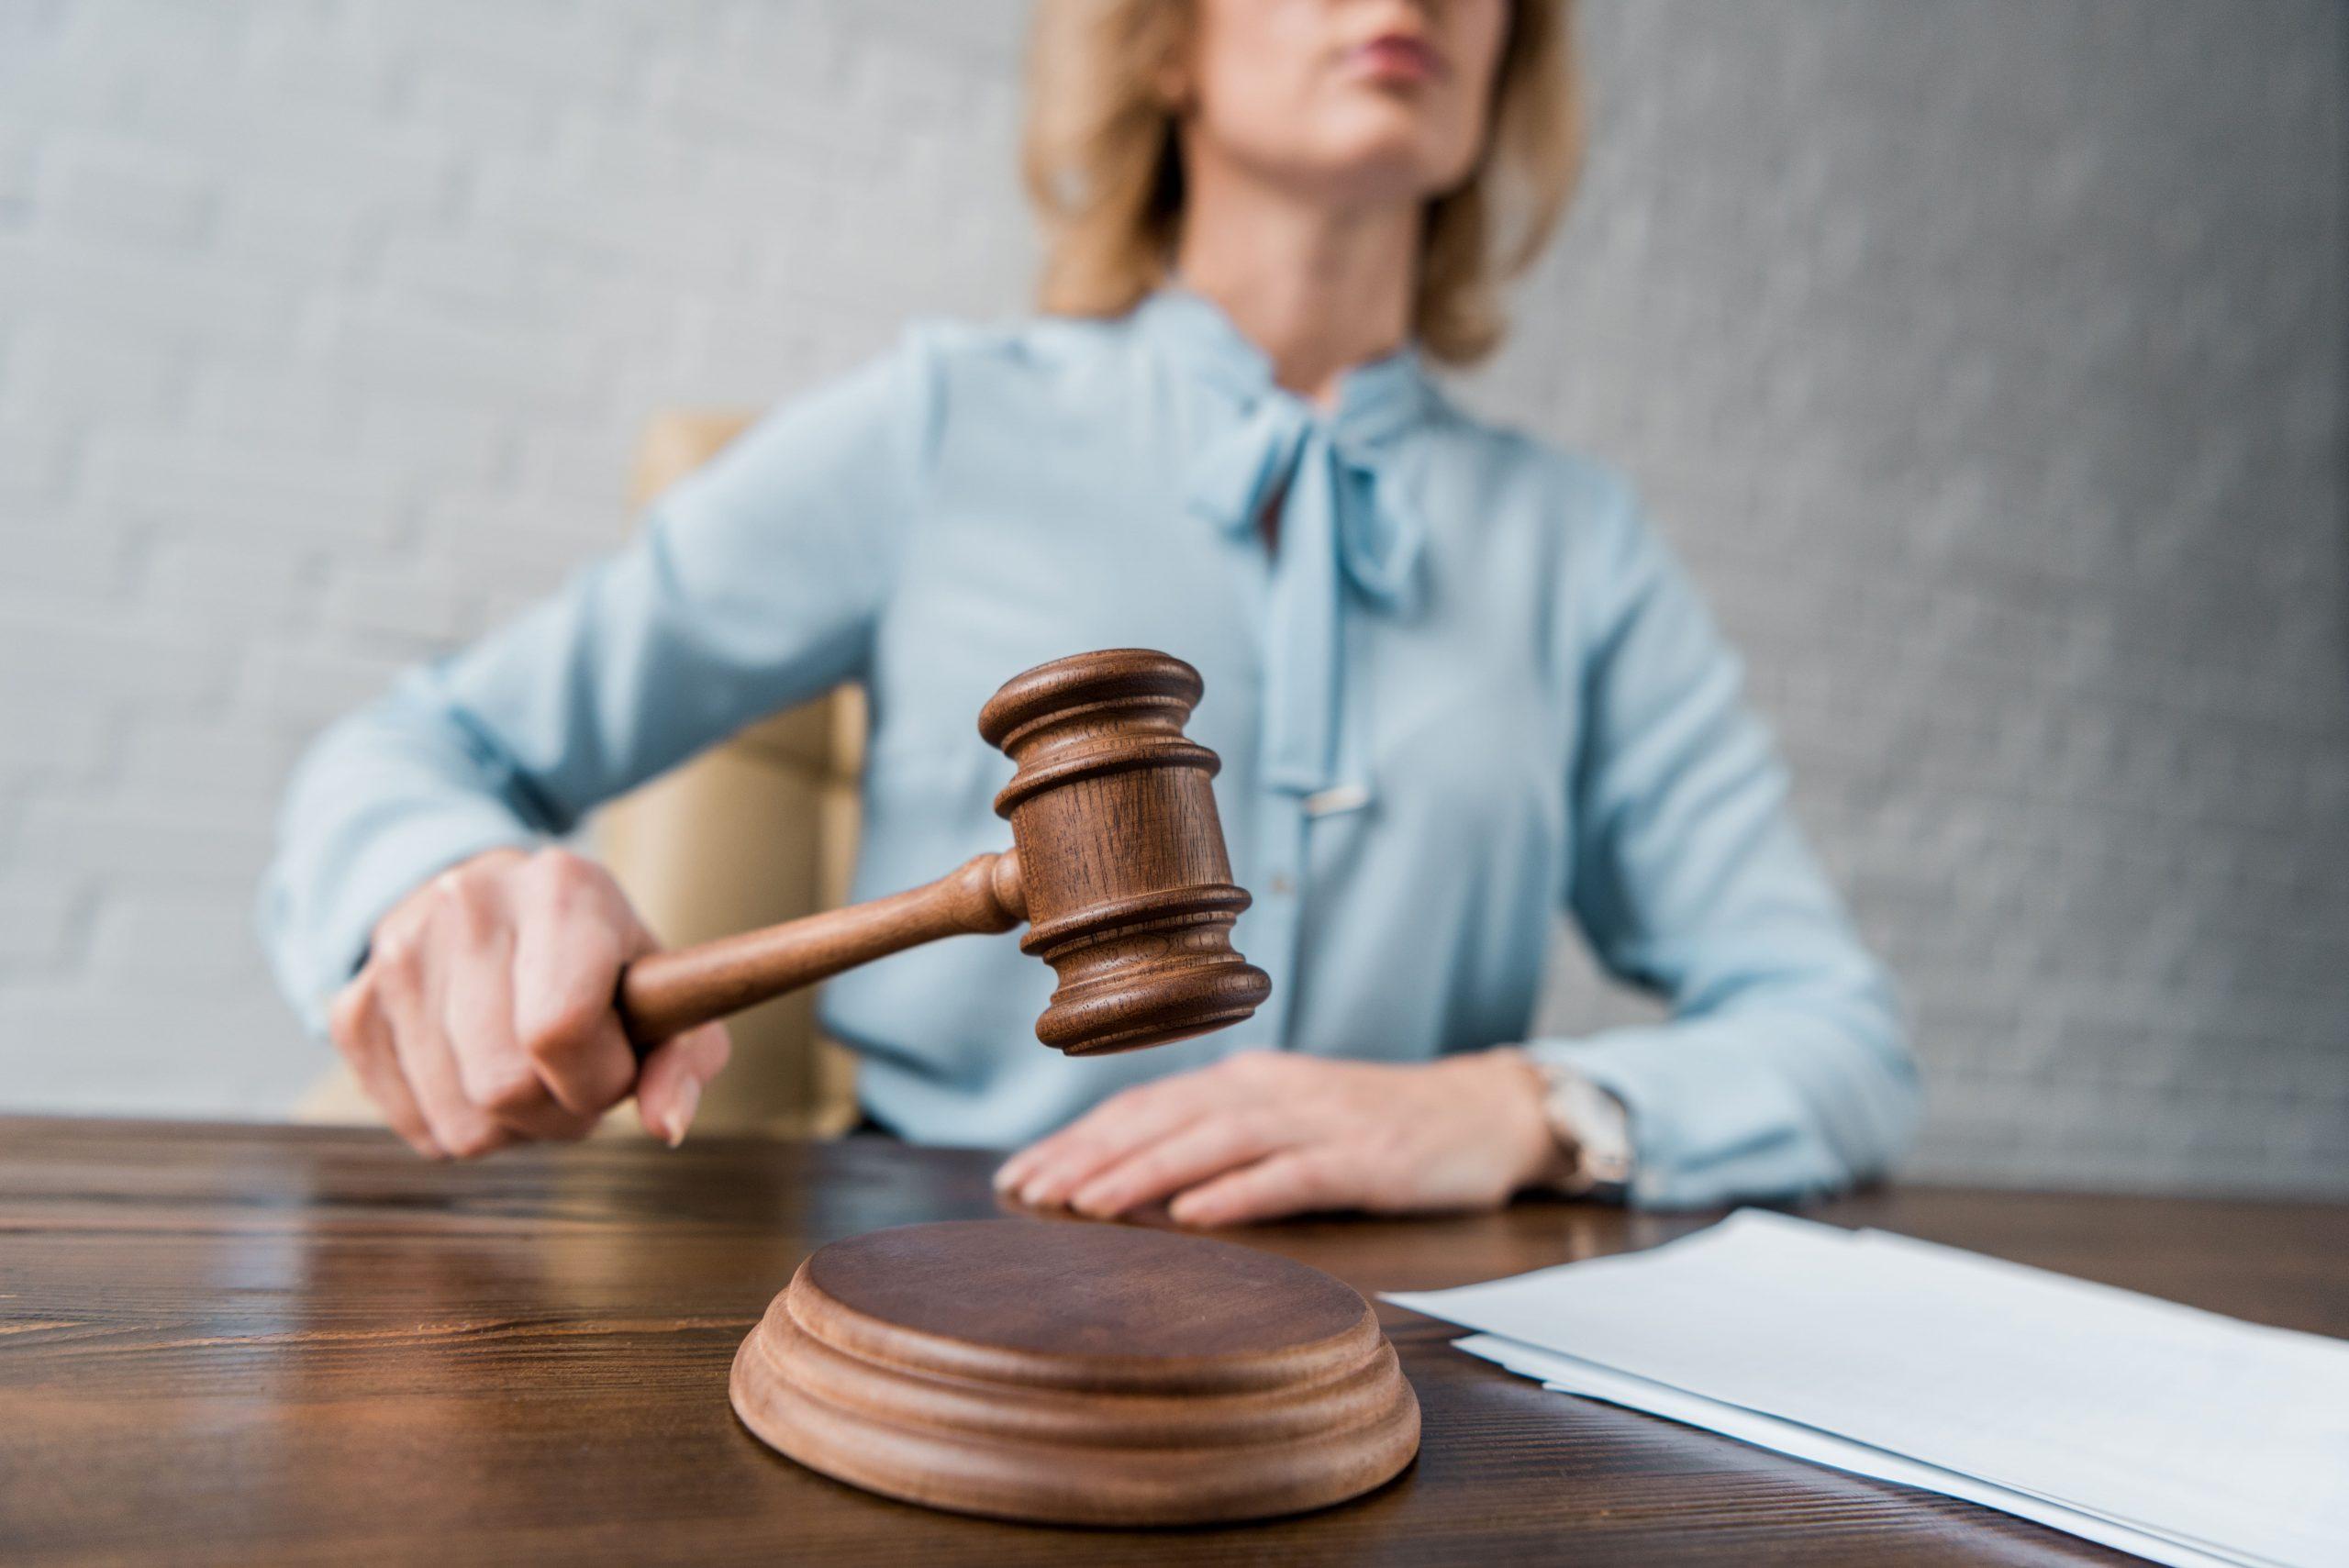 cropped-shot-of-female-judge-holding-wooden-hammer-ZLF37XG